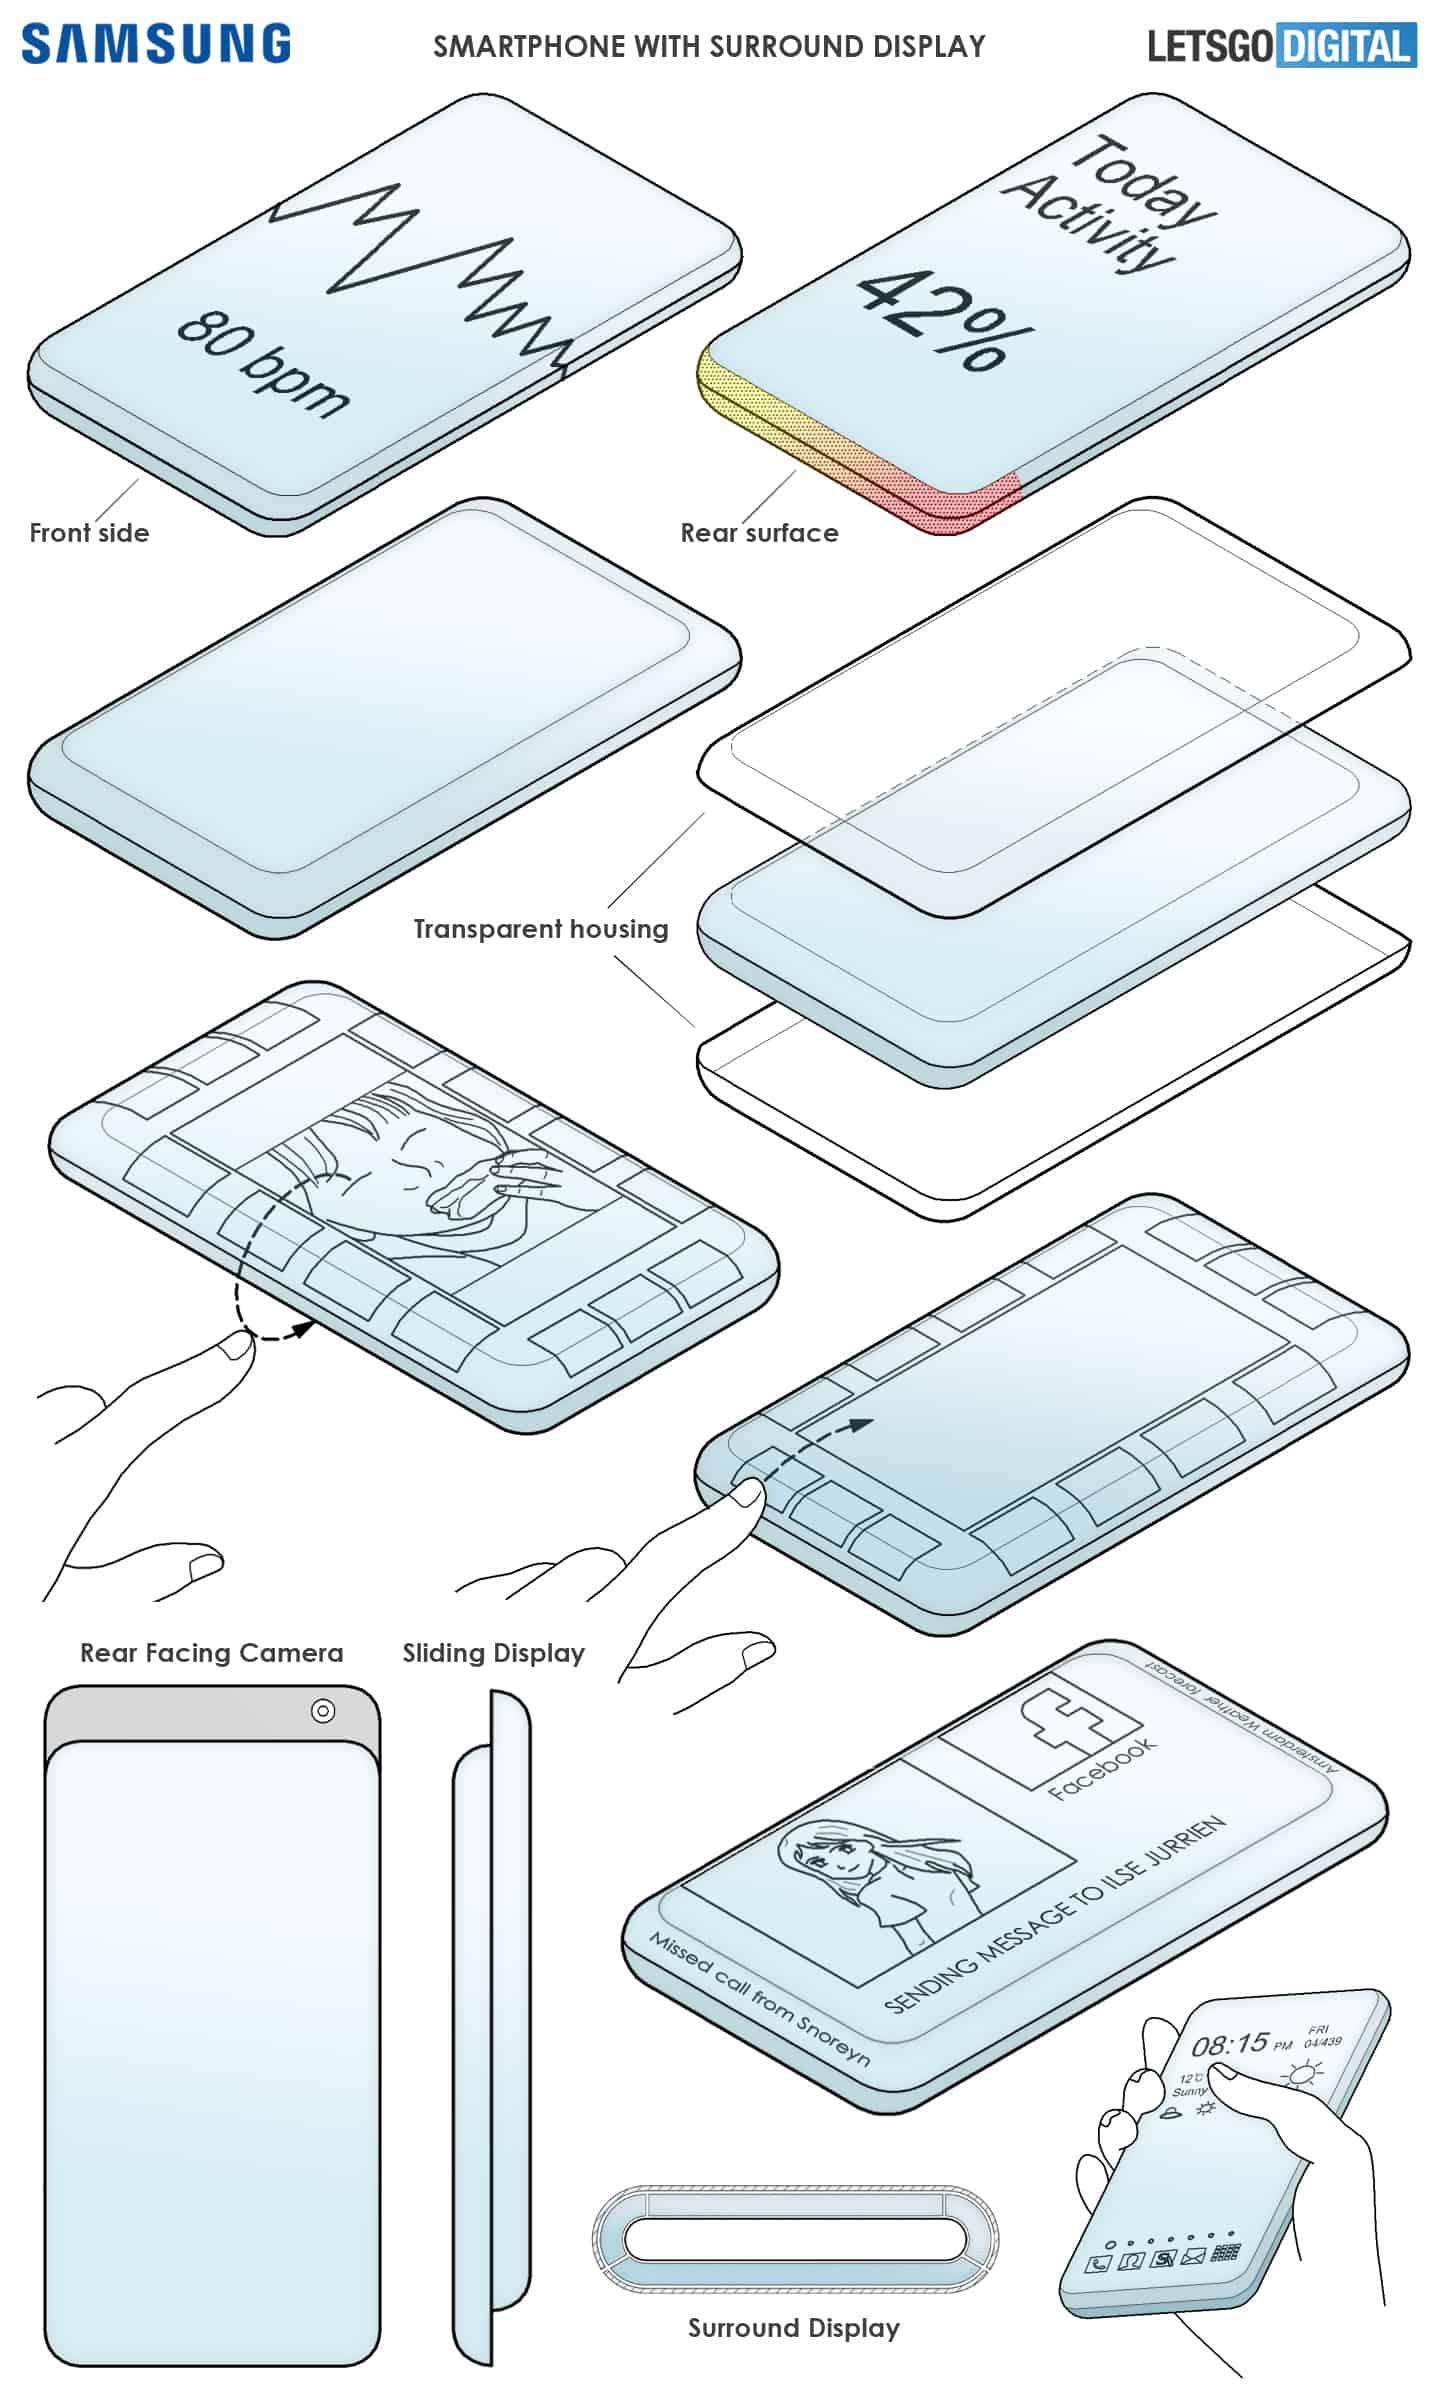 samsung galaxy telefoon surround display patent